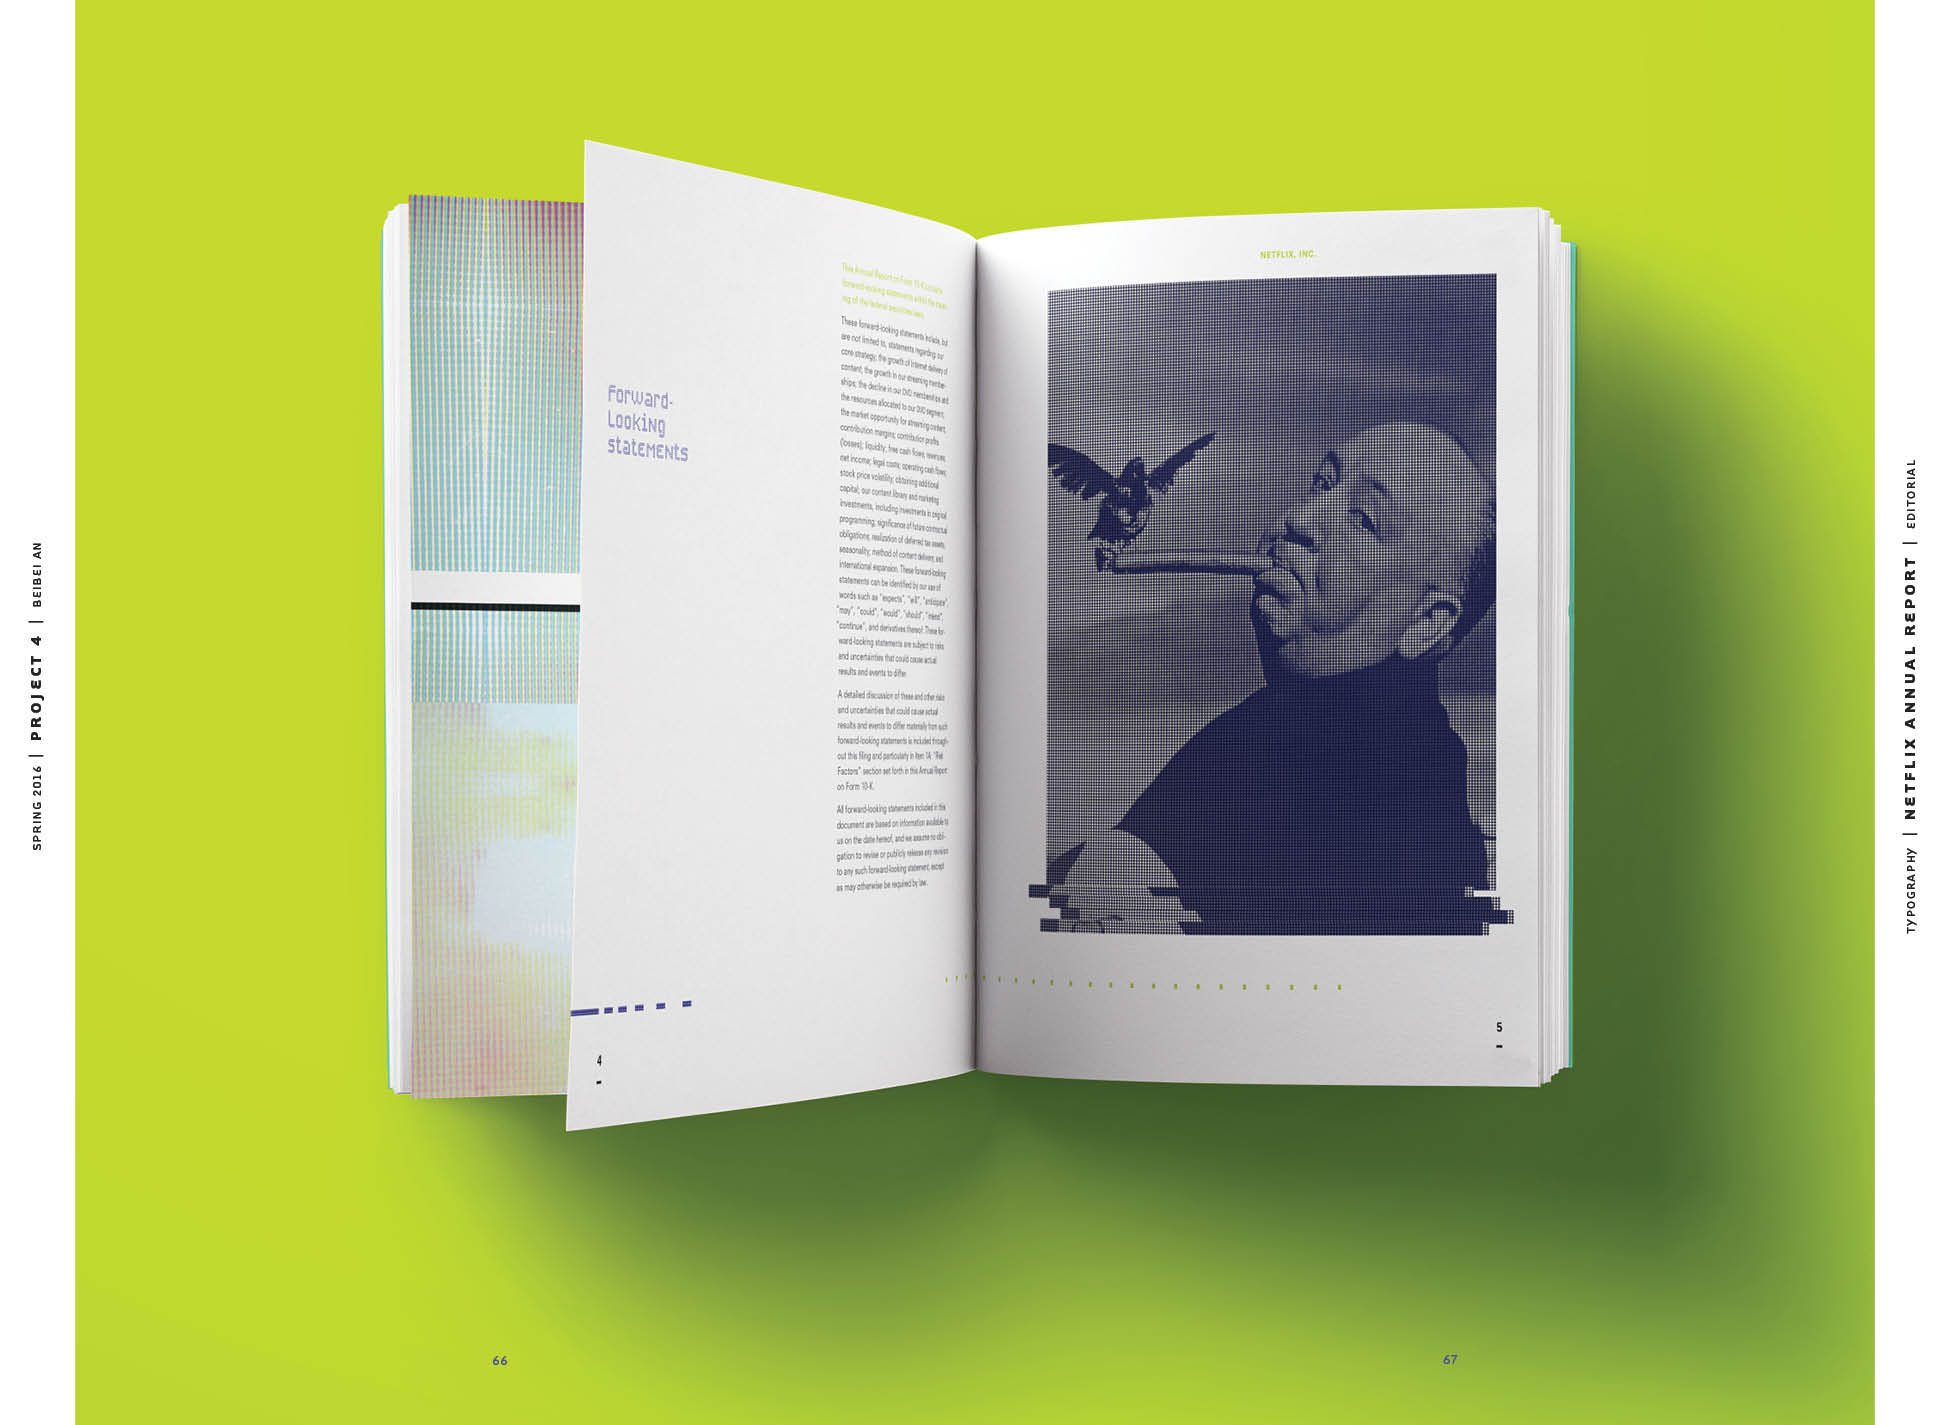 Beibei An_Portfolio cover40.jpg